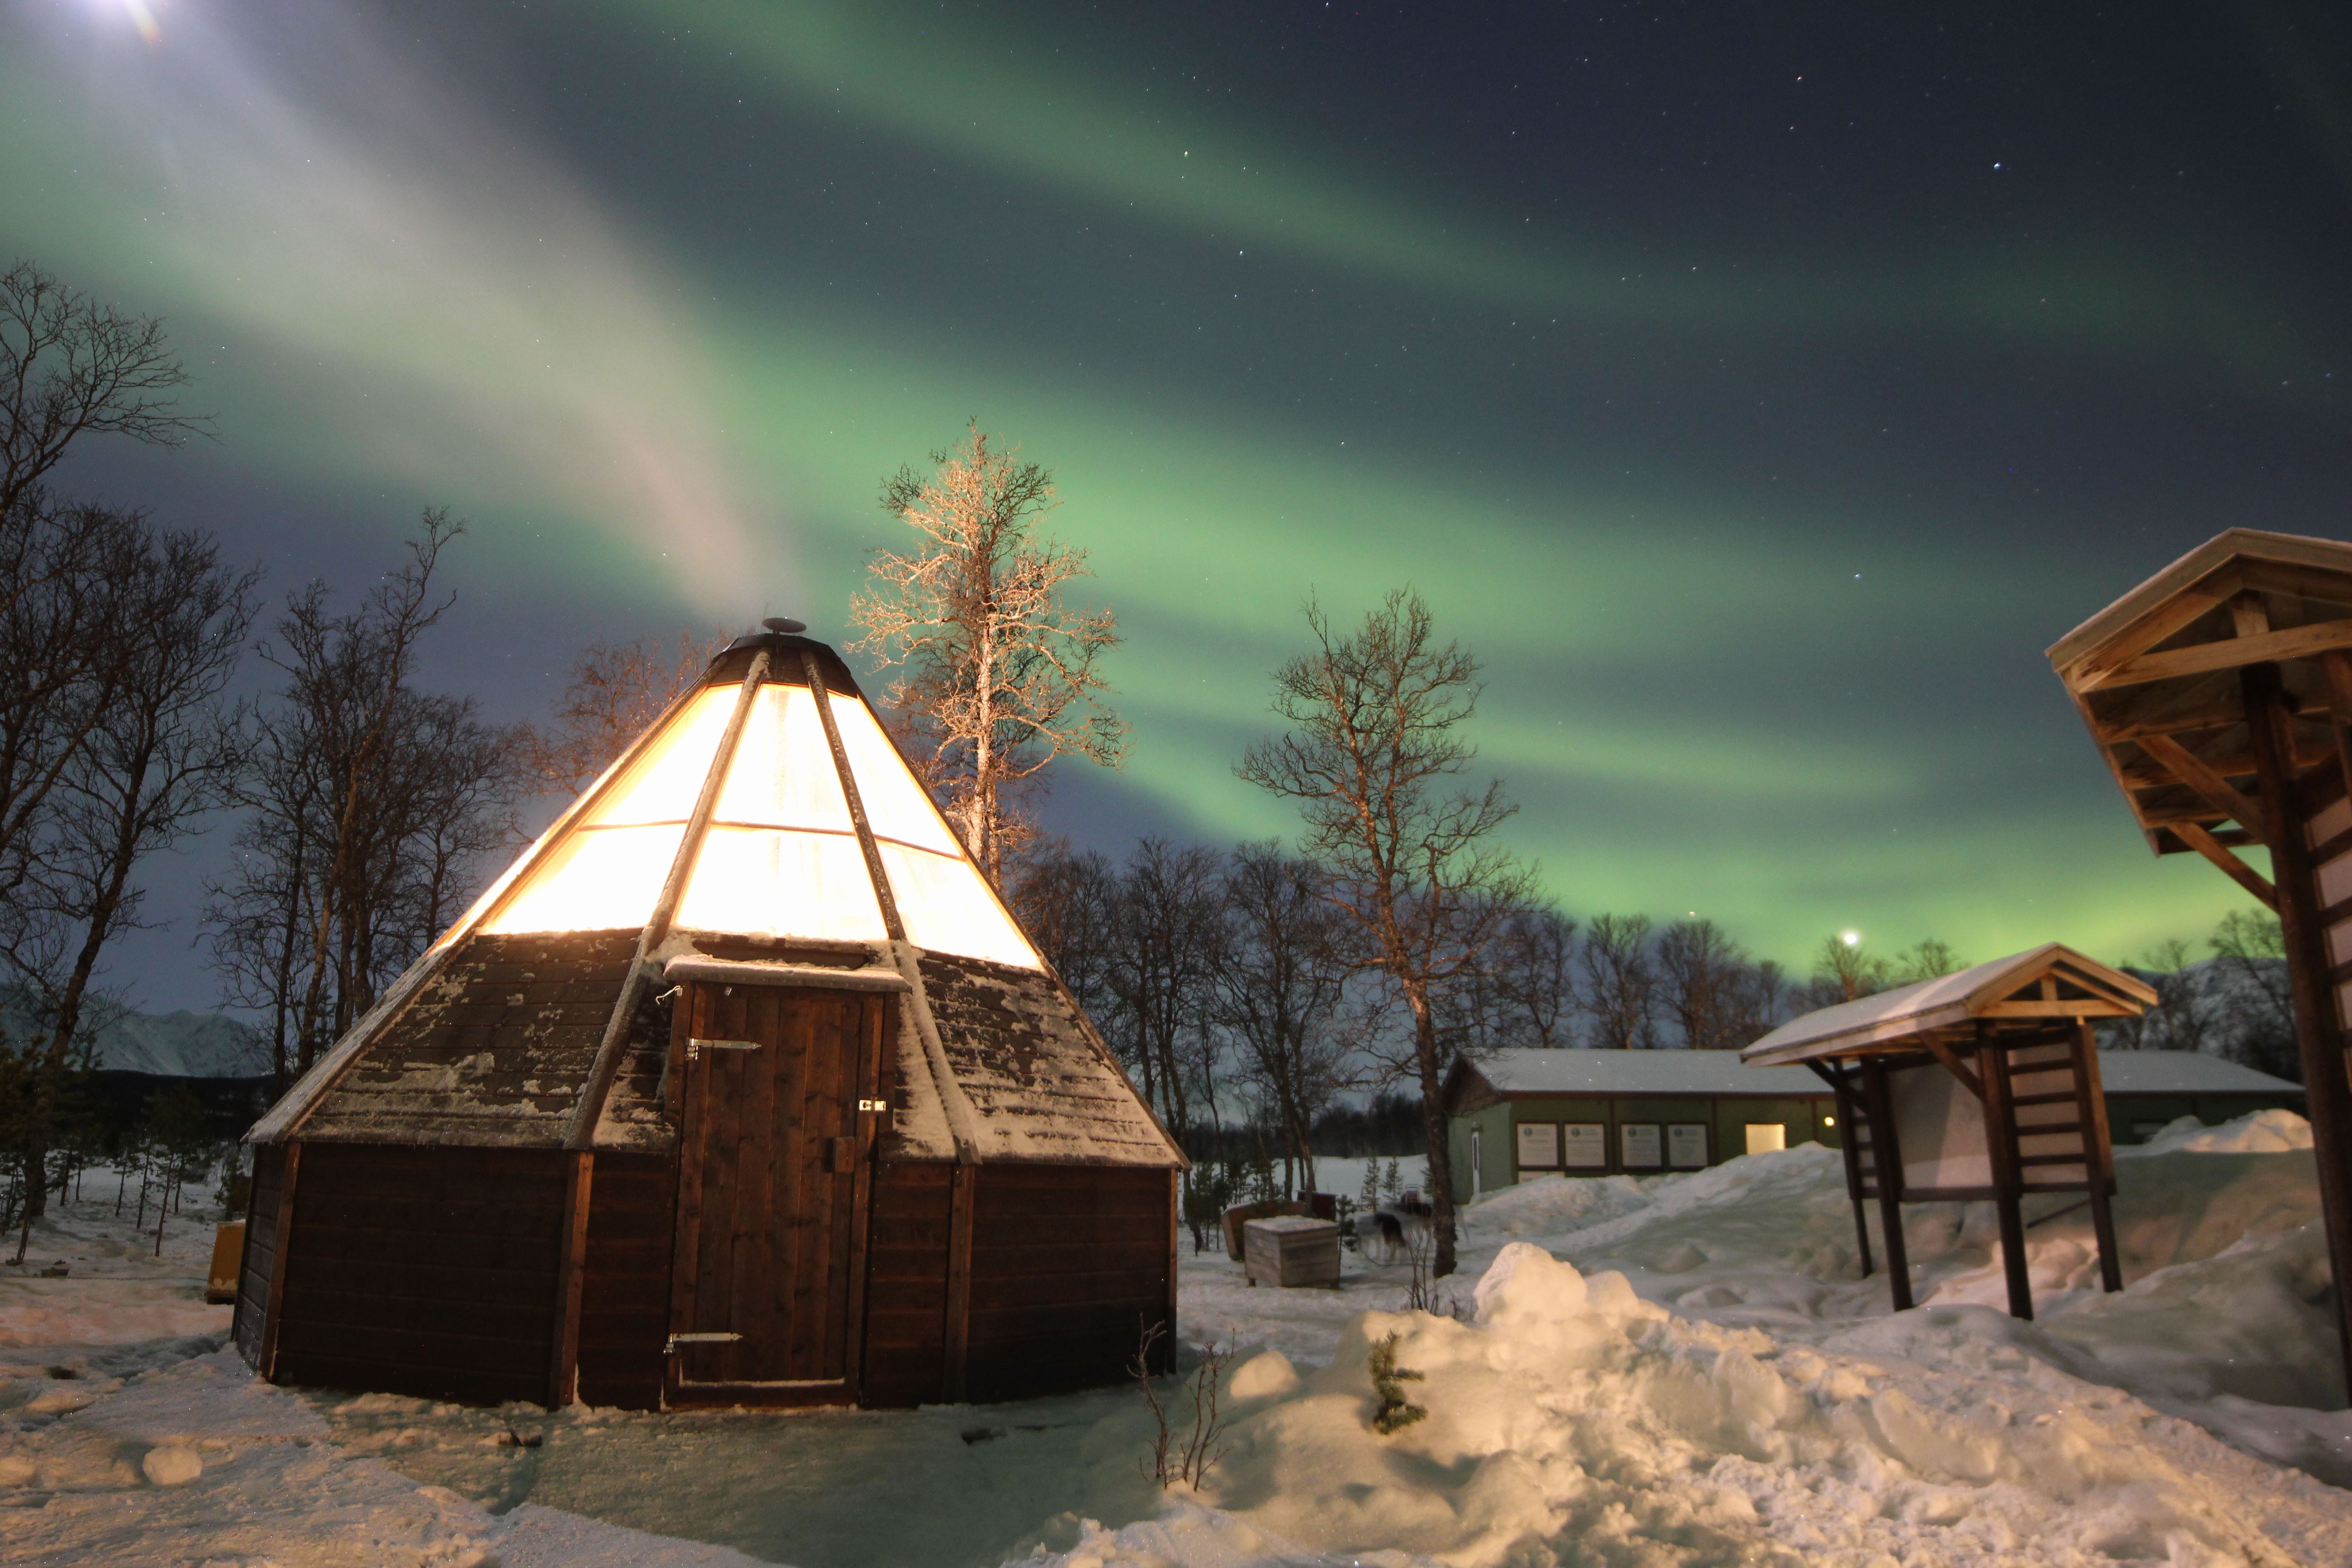 Northern Light night - Aurora Alps